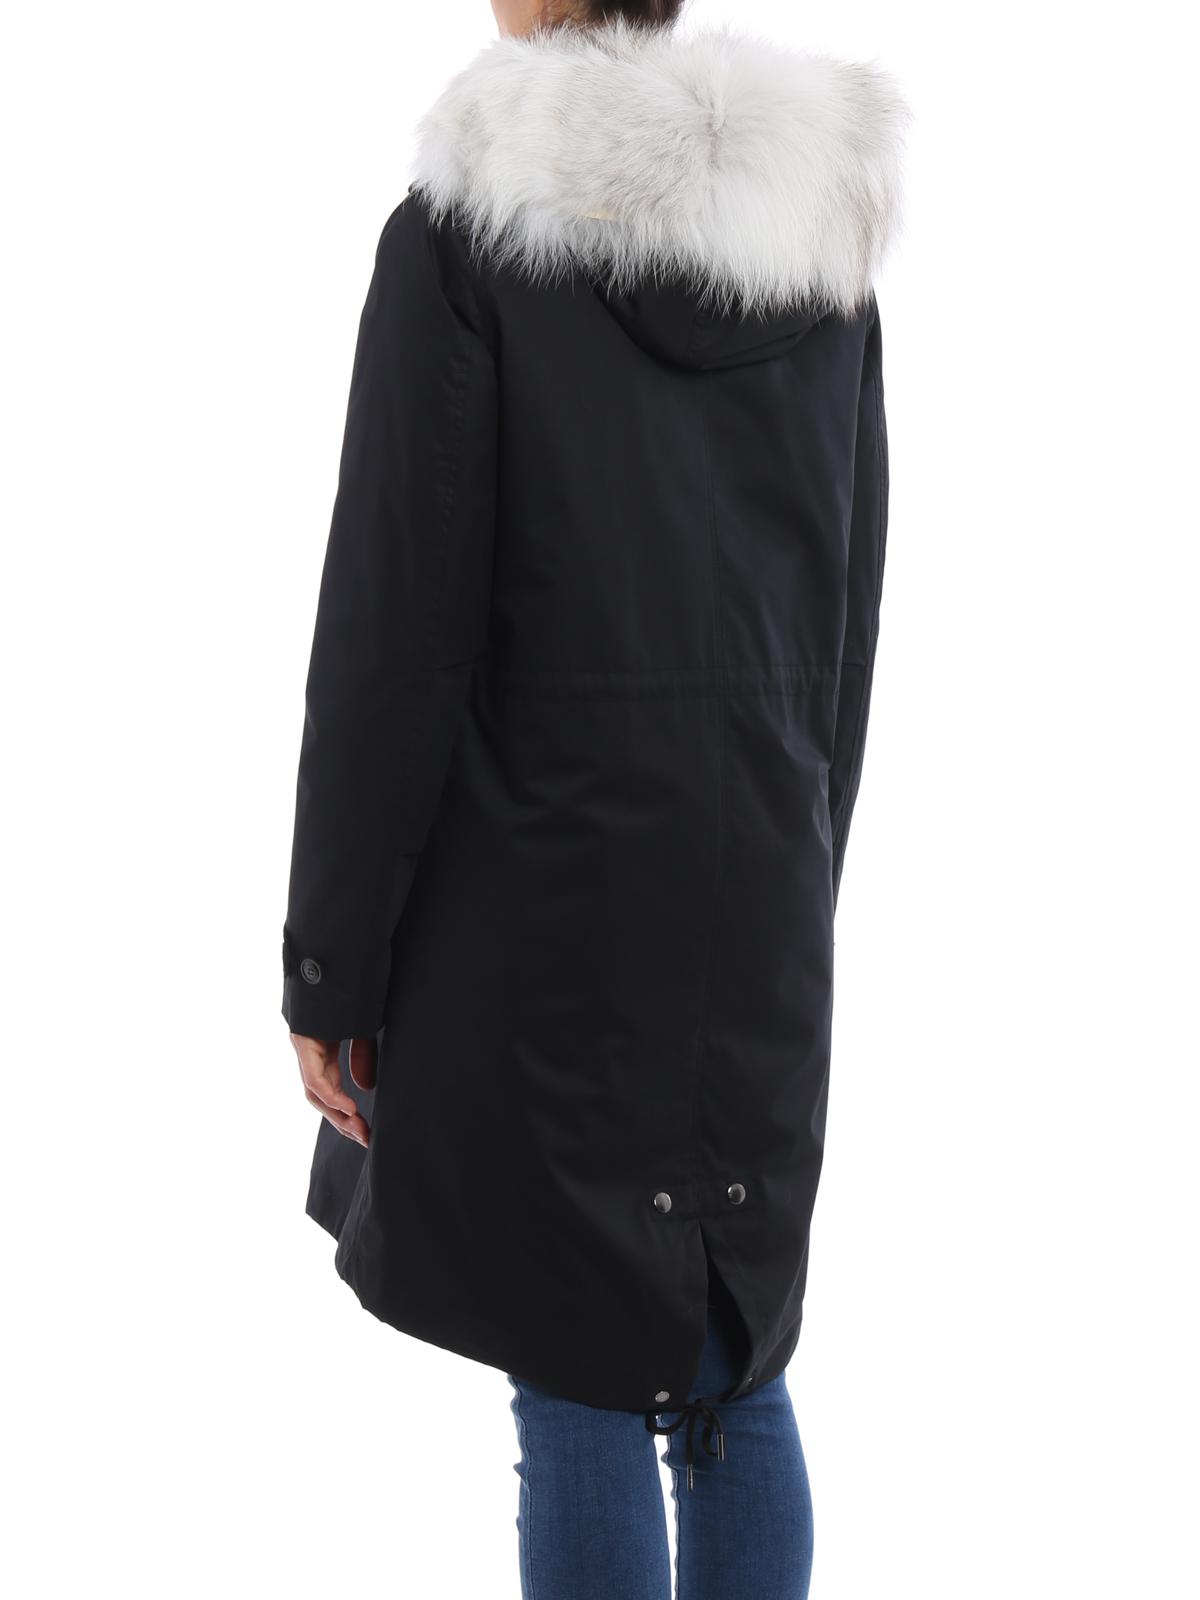 Parka 100 Lm10 Woolrich Literary Fox Eskimo Parkas Wwcps2501 1S8wdvq